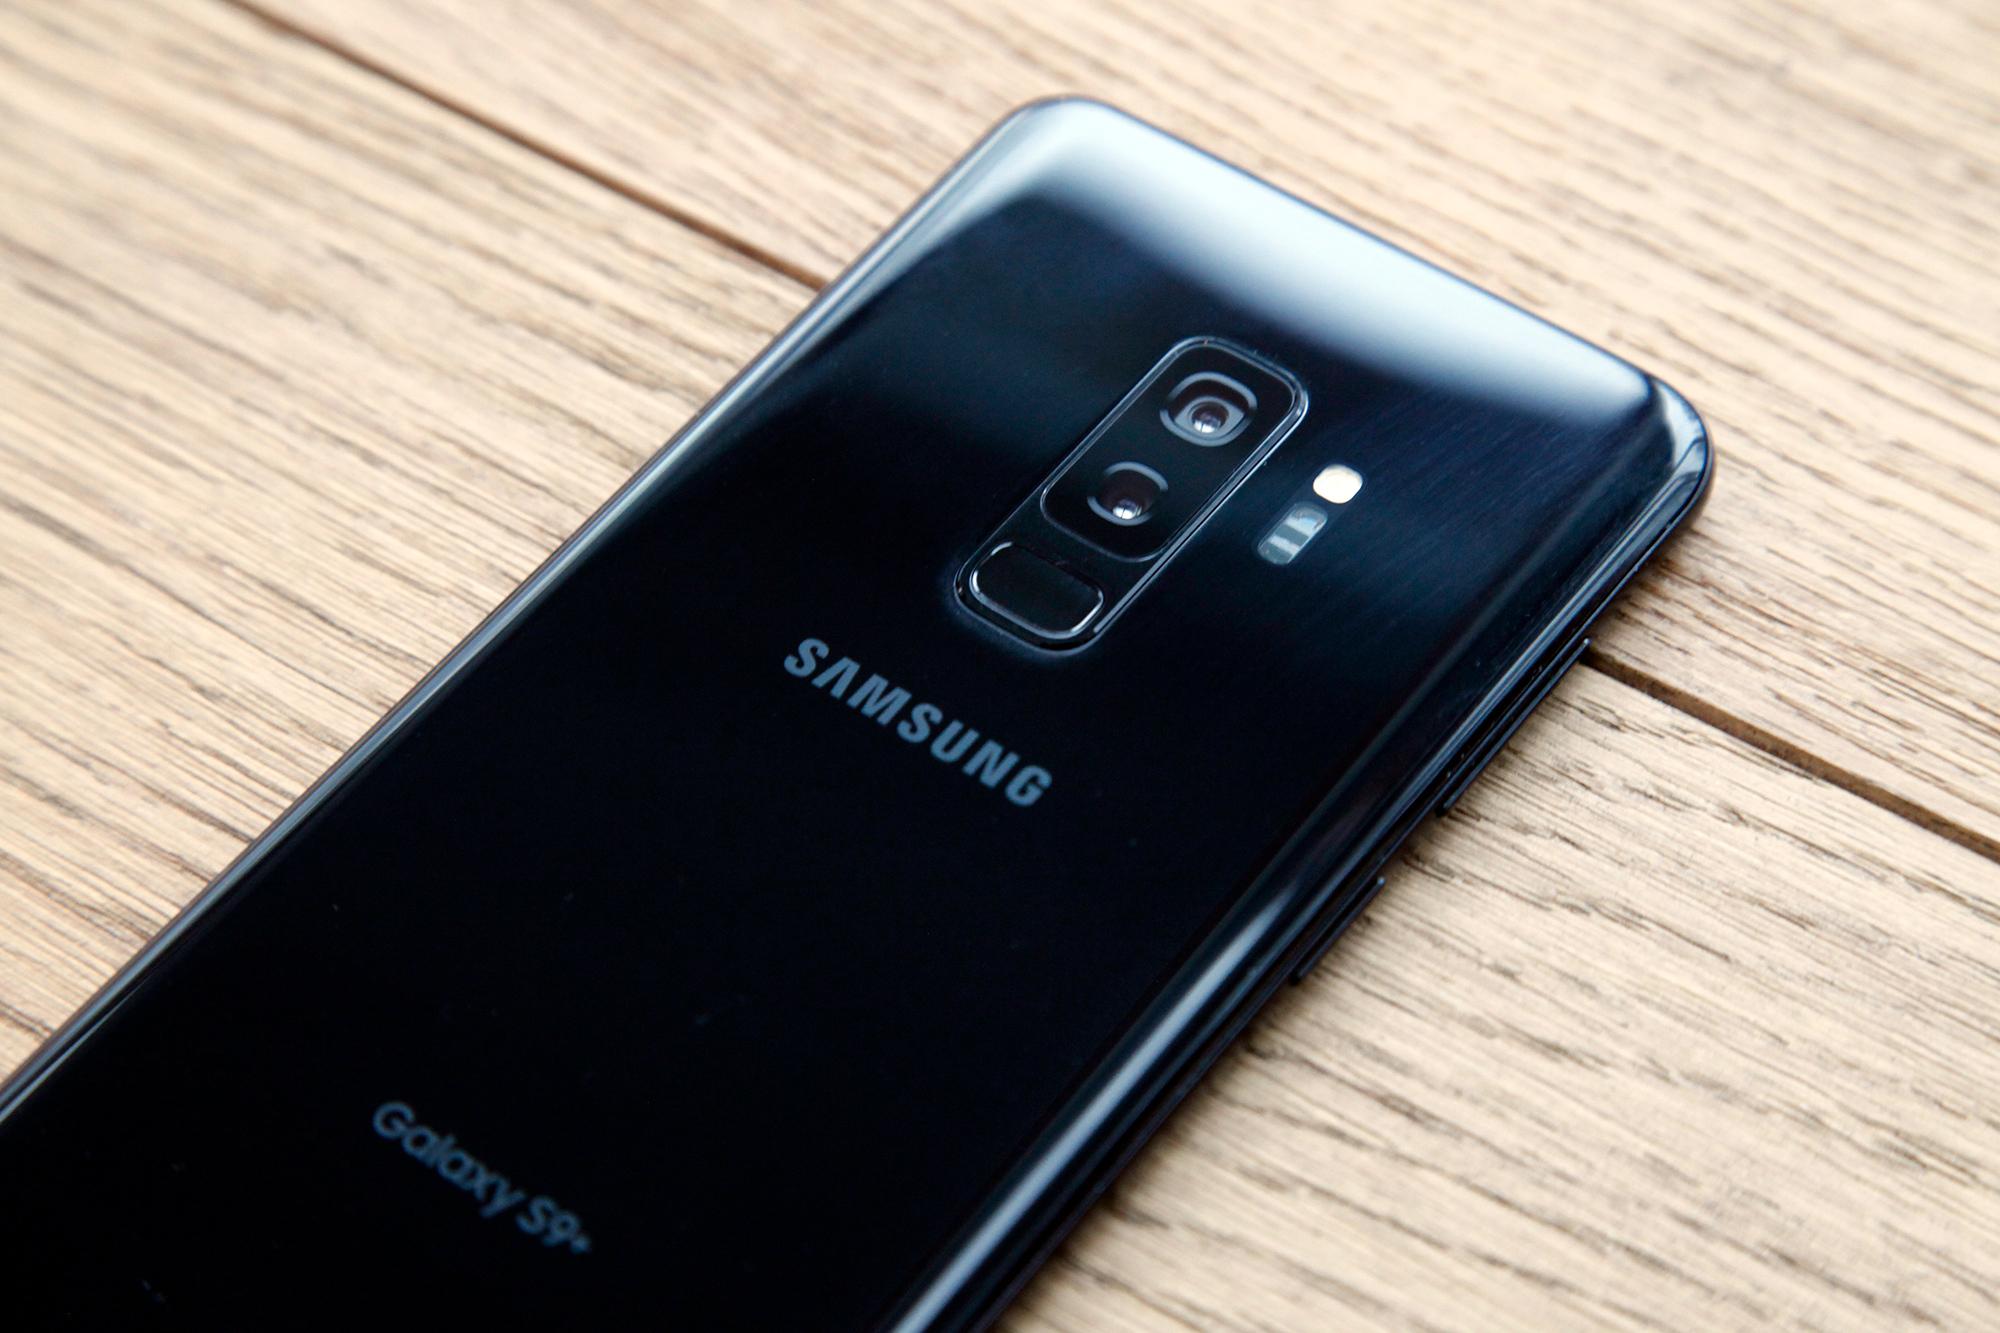 samsung-galaxy-s9 black back